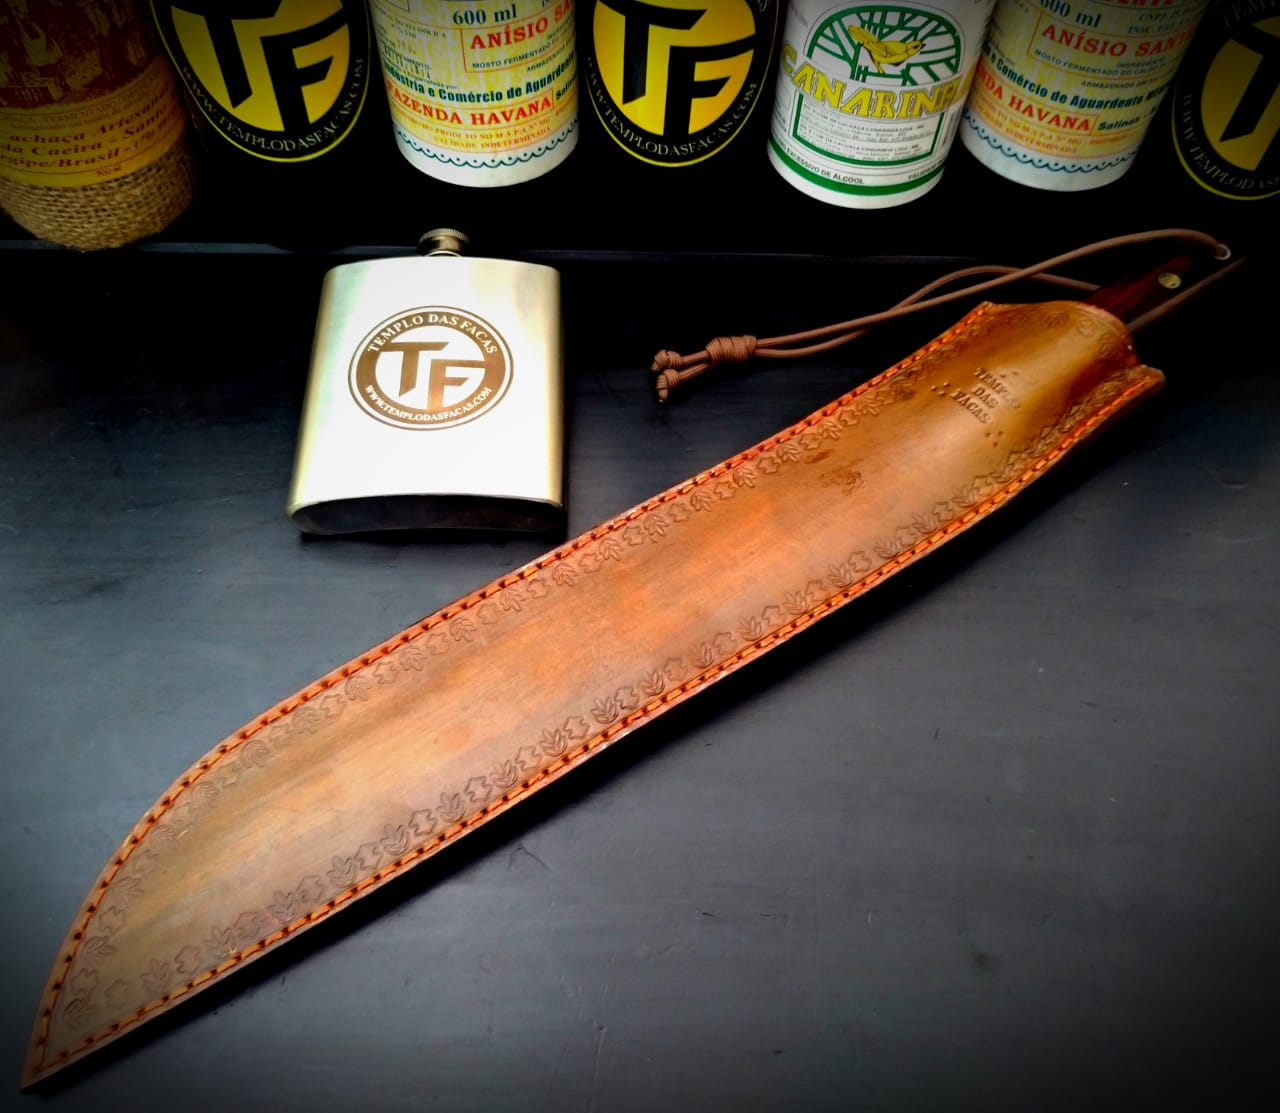 TF Facão sertanejo artesanal 13 polegadas